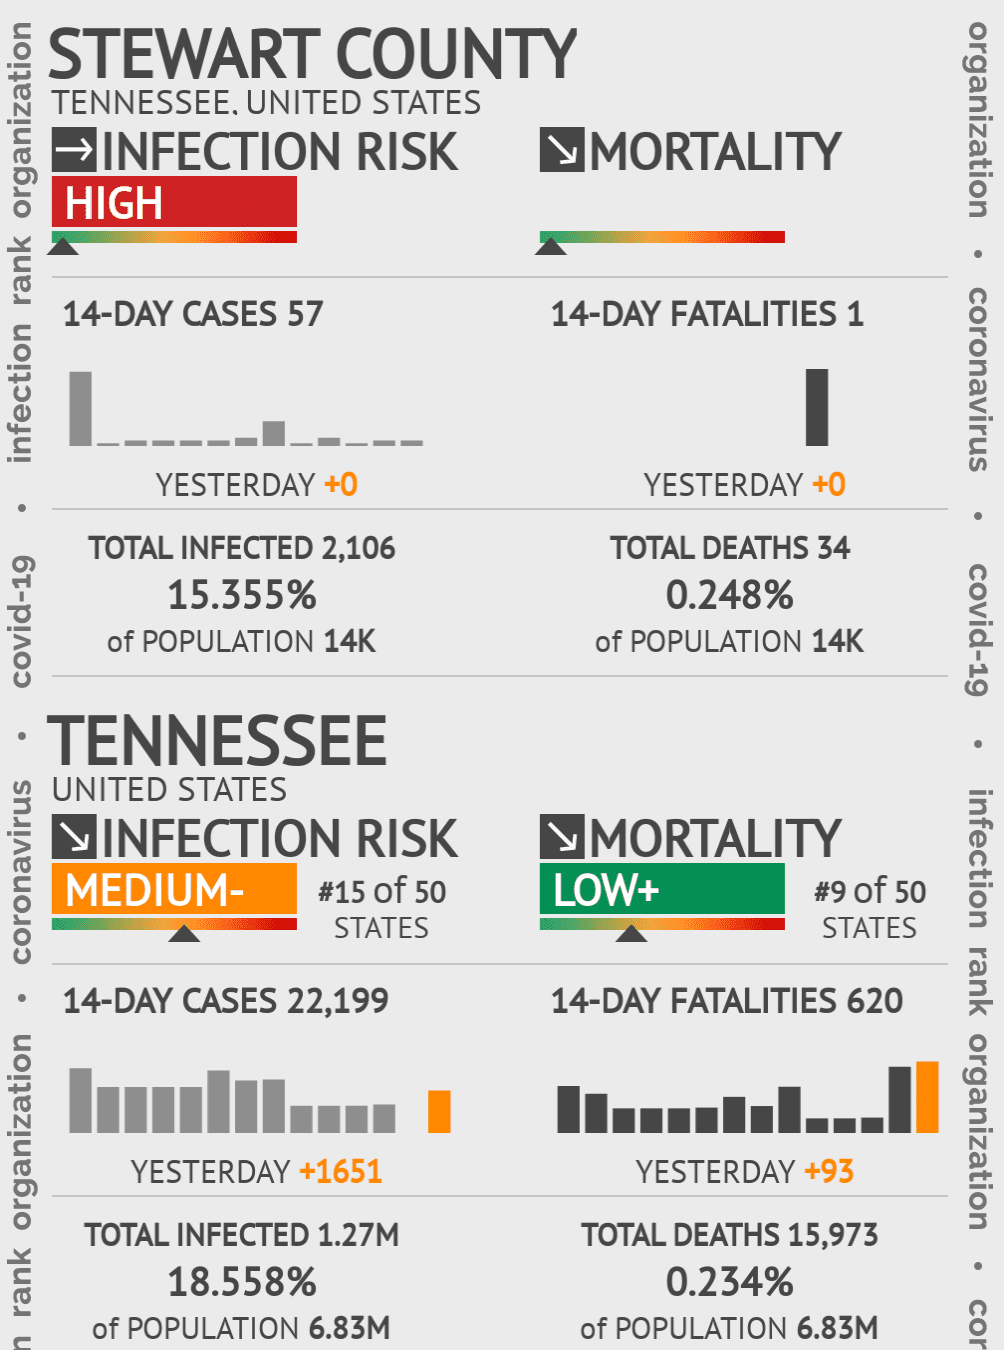 Stewart County Coronavirus Covid-19 Risk of Infection on November 26, 2020